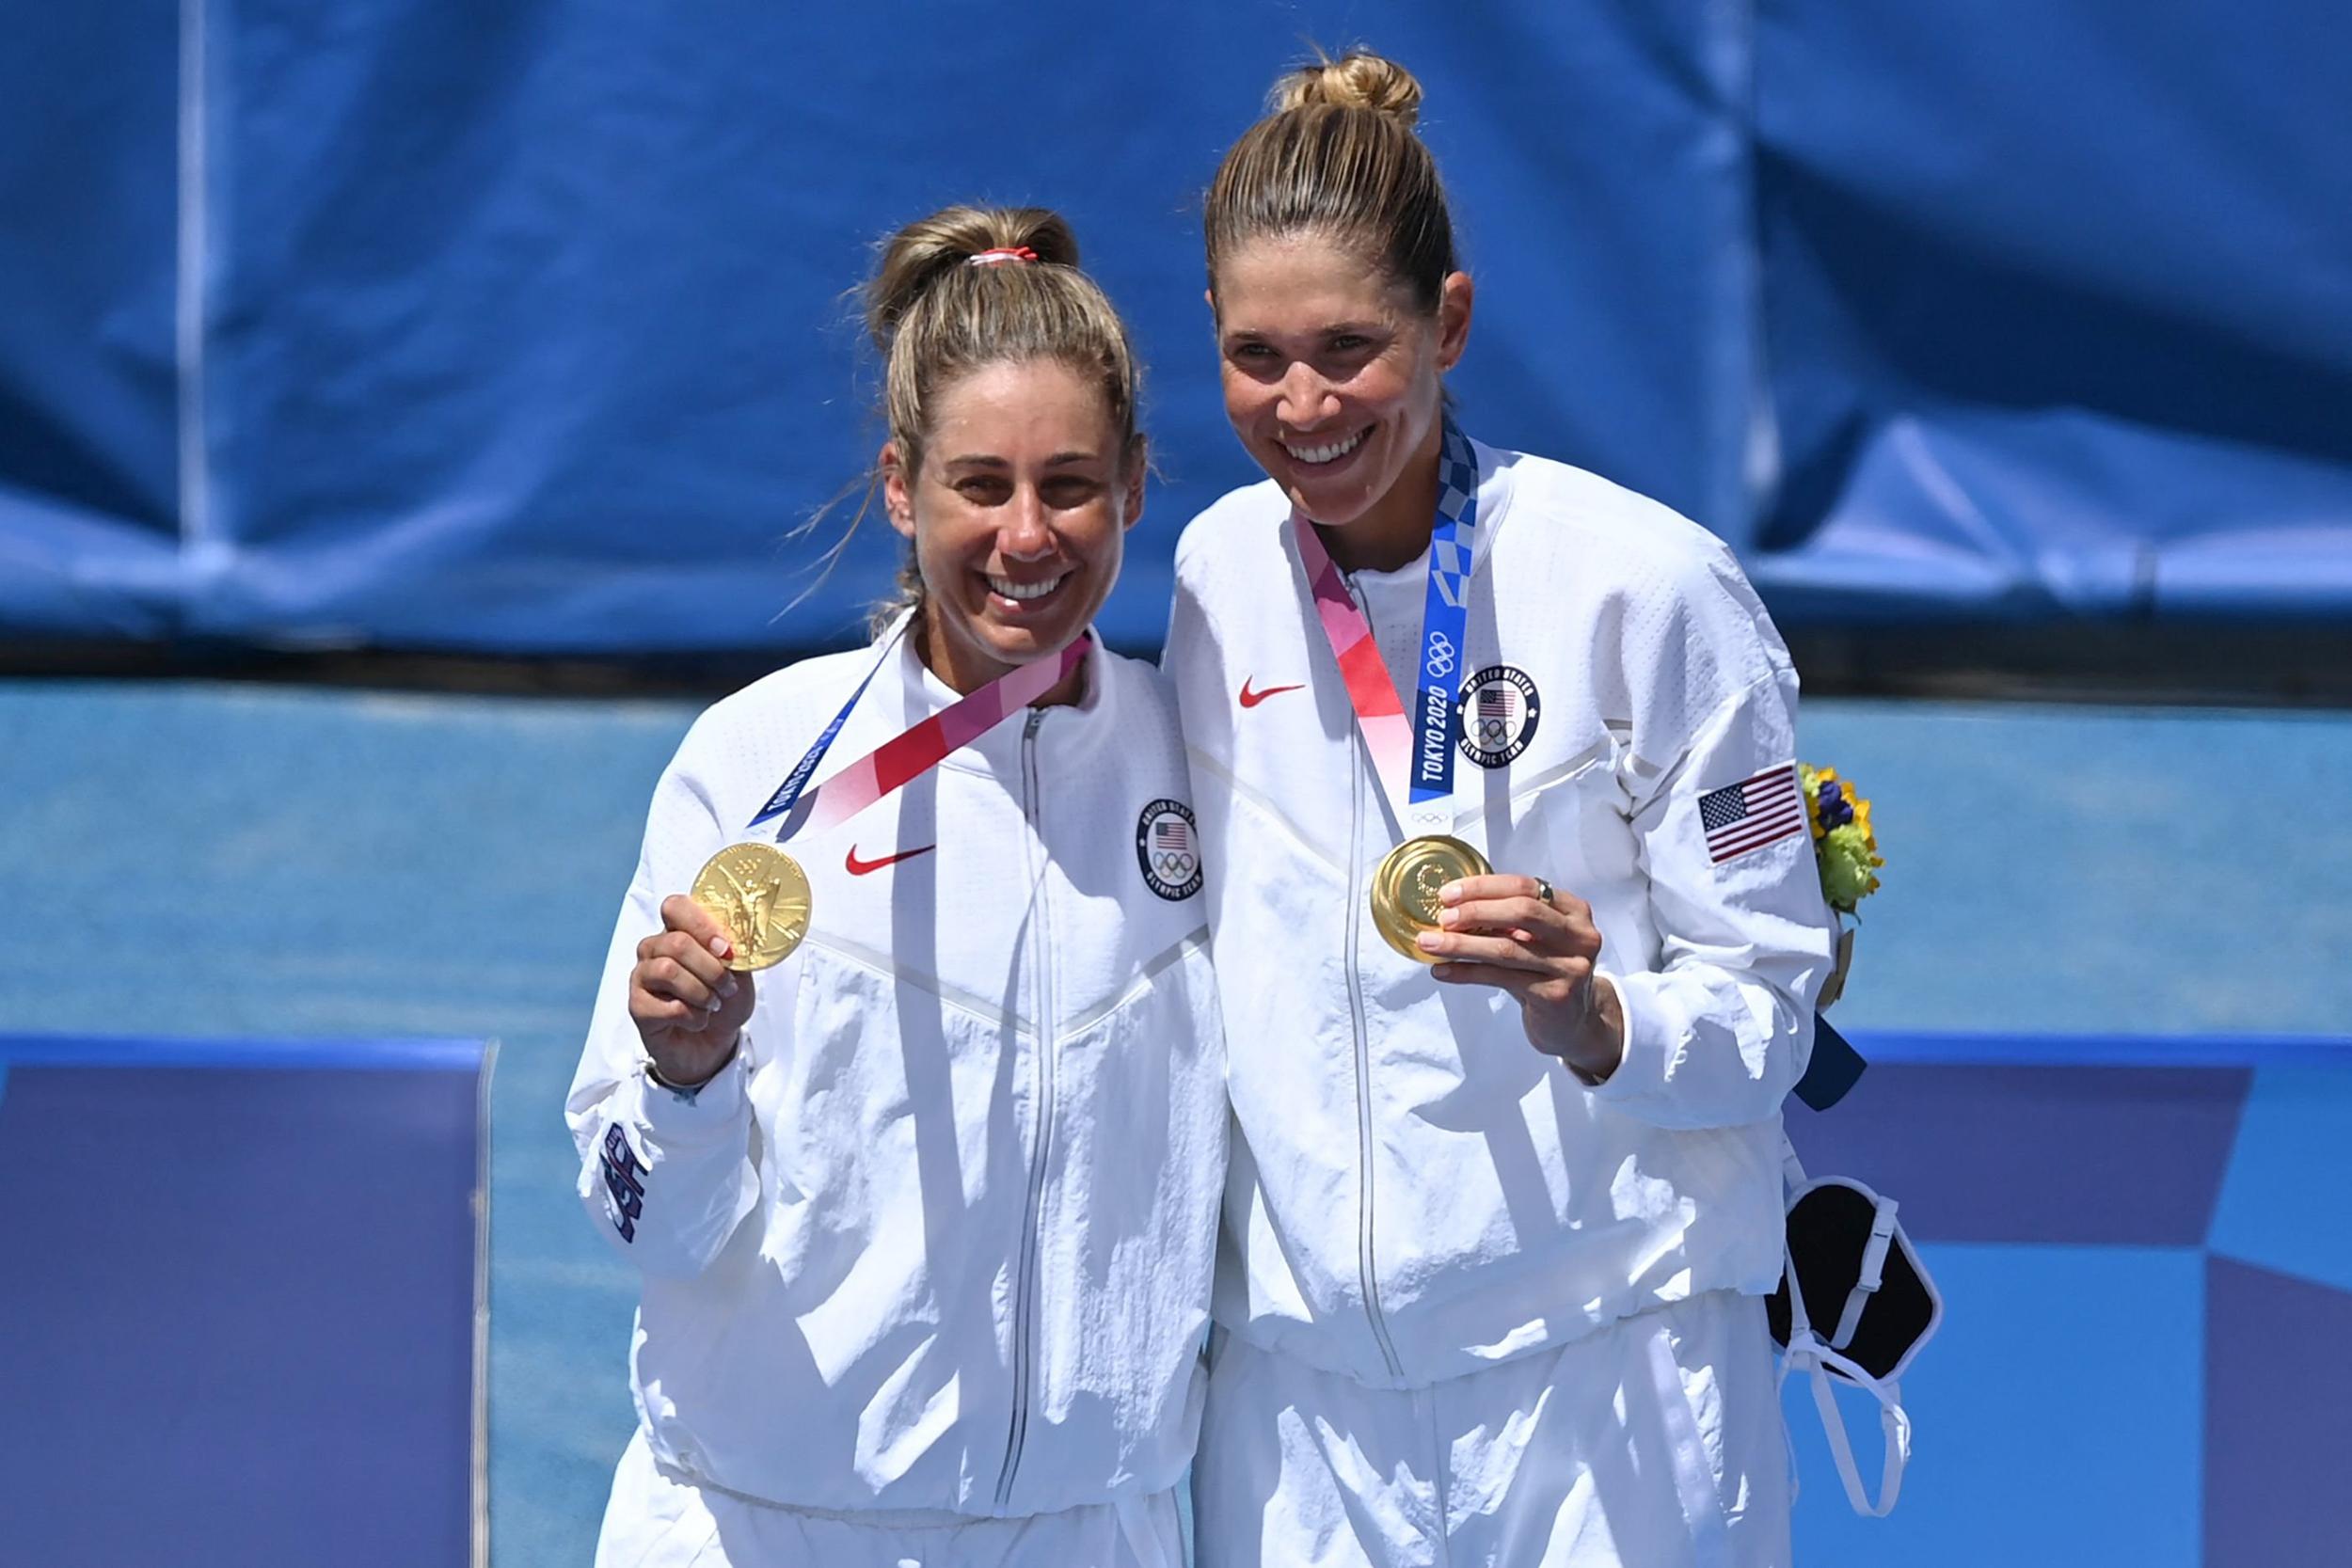 U.S. beach volleyball's Ross, Klineman capture Olympic gold in Tokyo